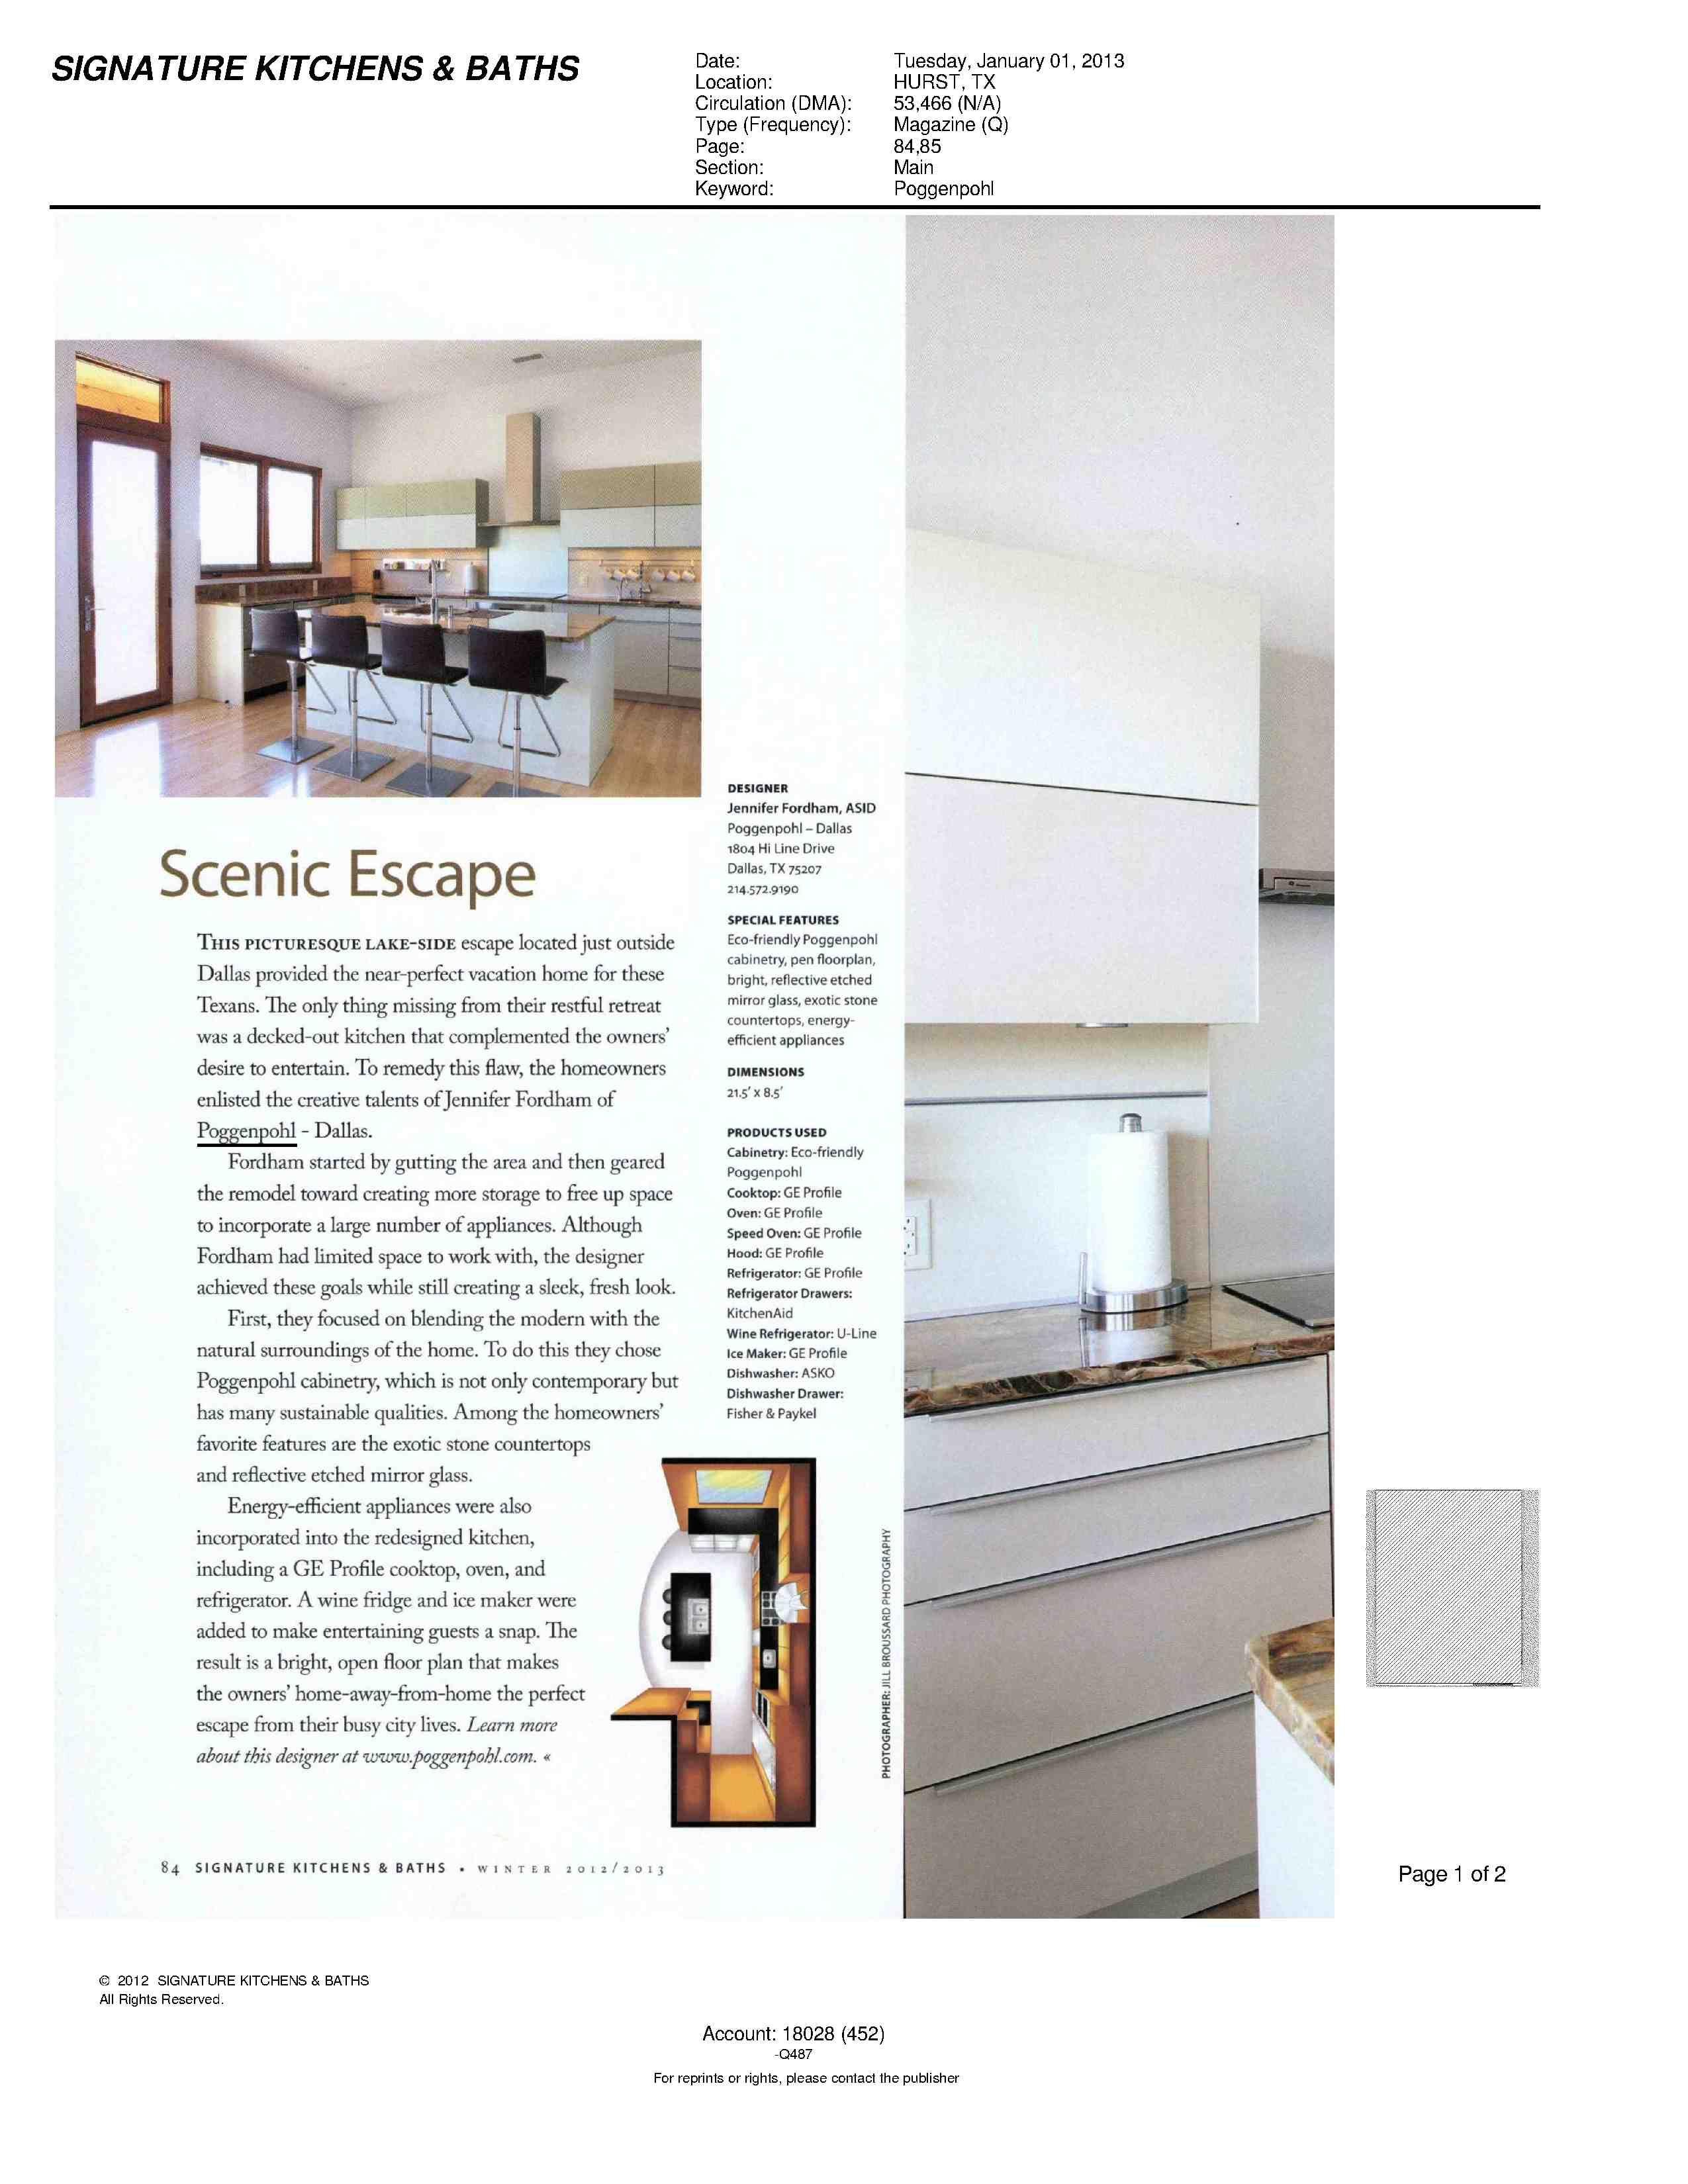 Signature Kitchens & Baths | Bath